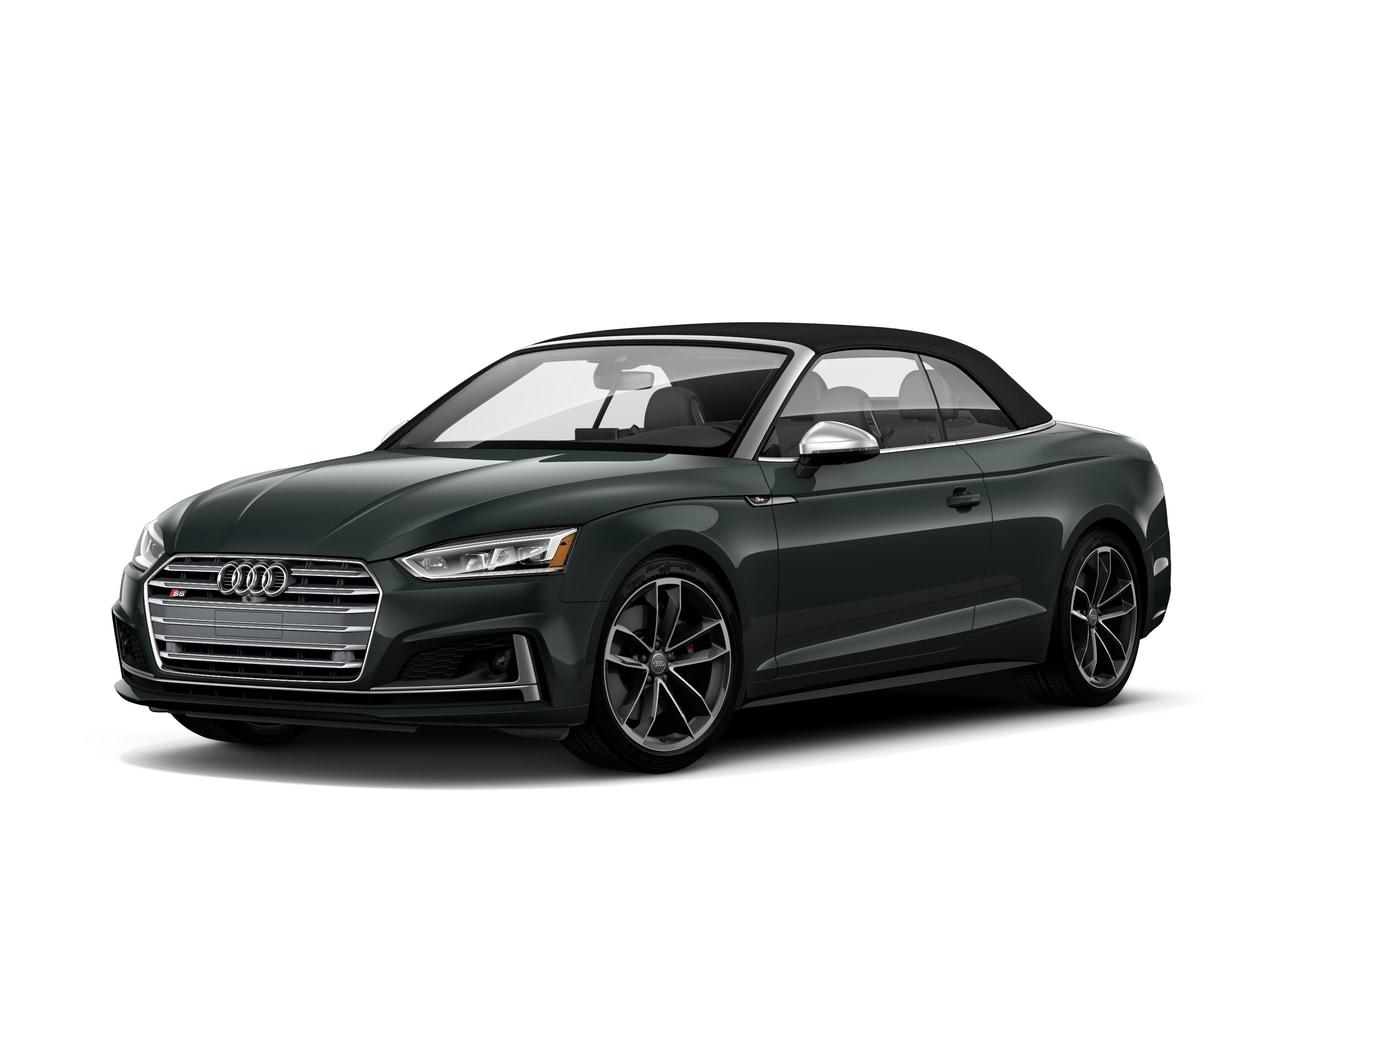 2018 Audi S5 Convertible